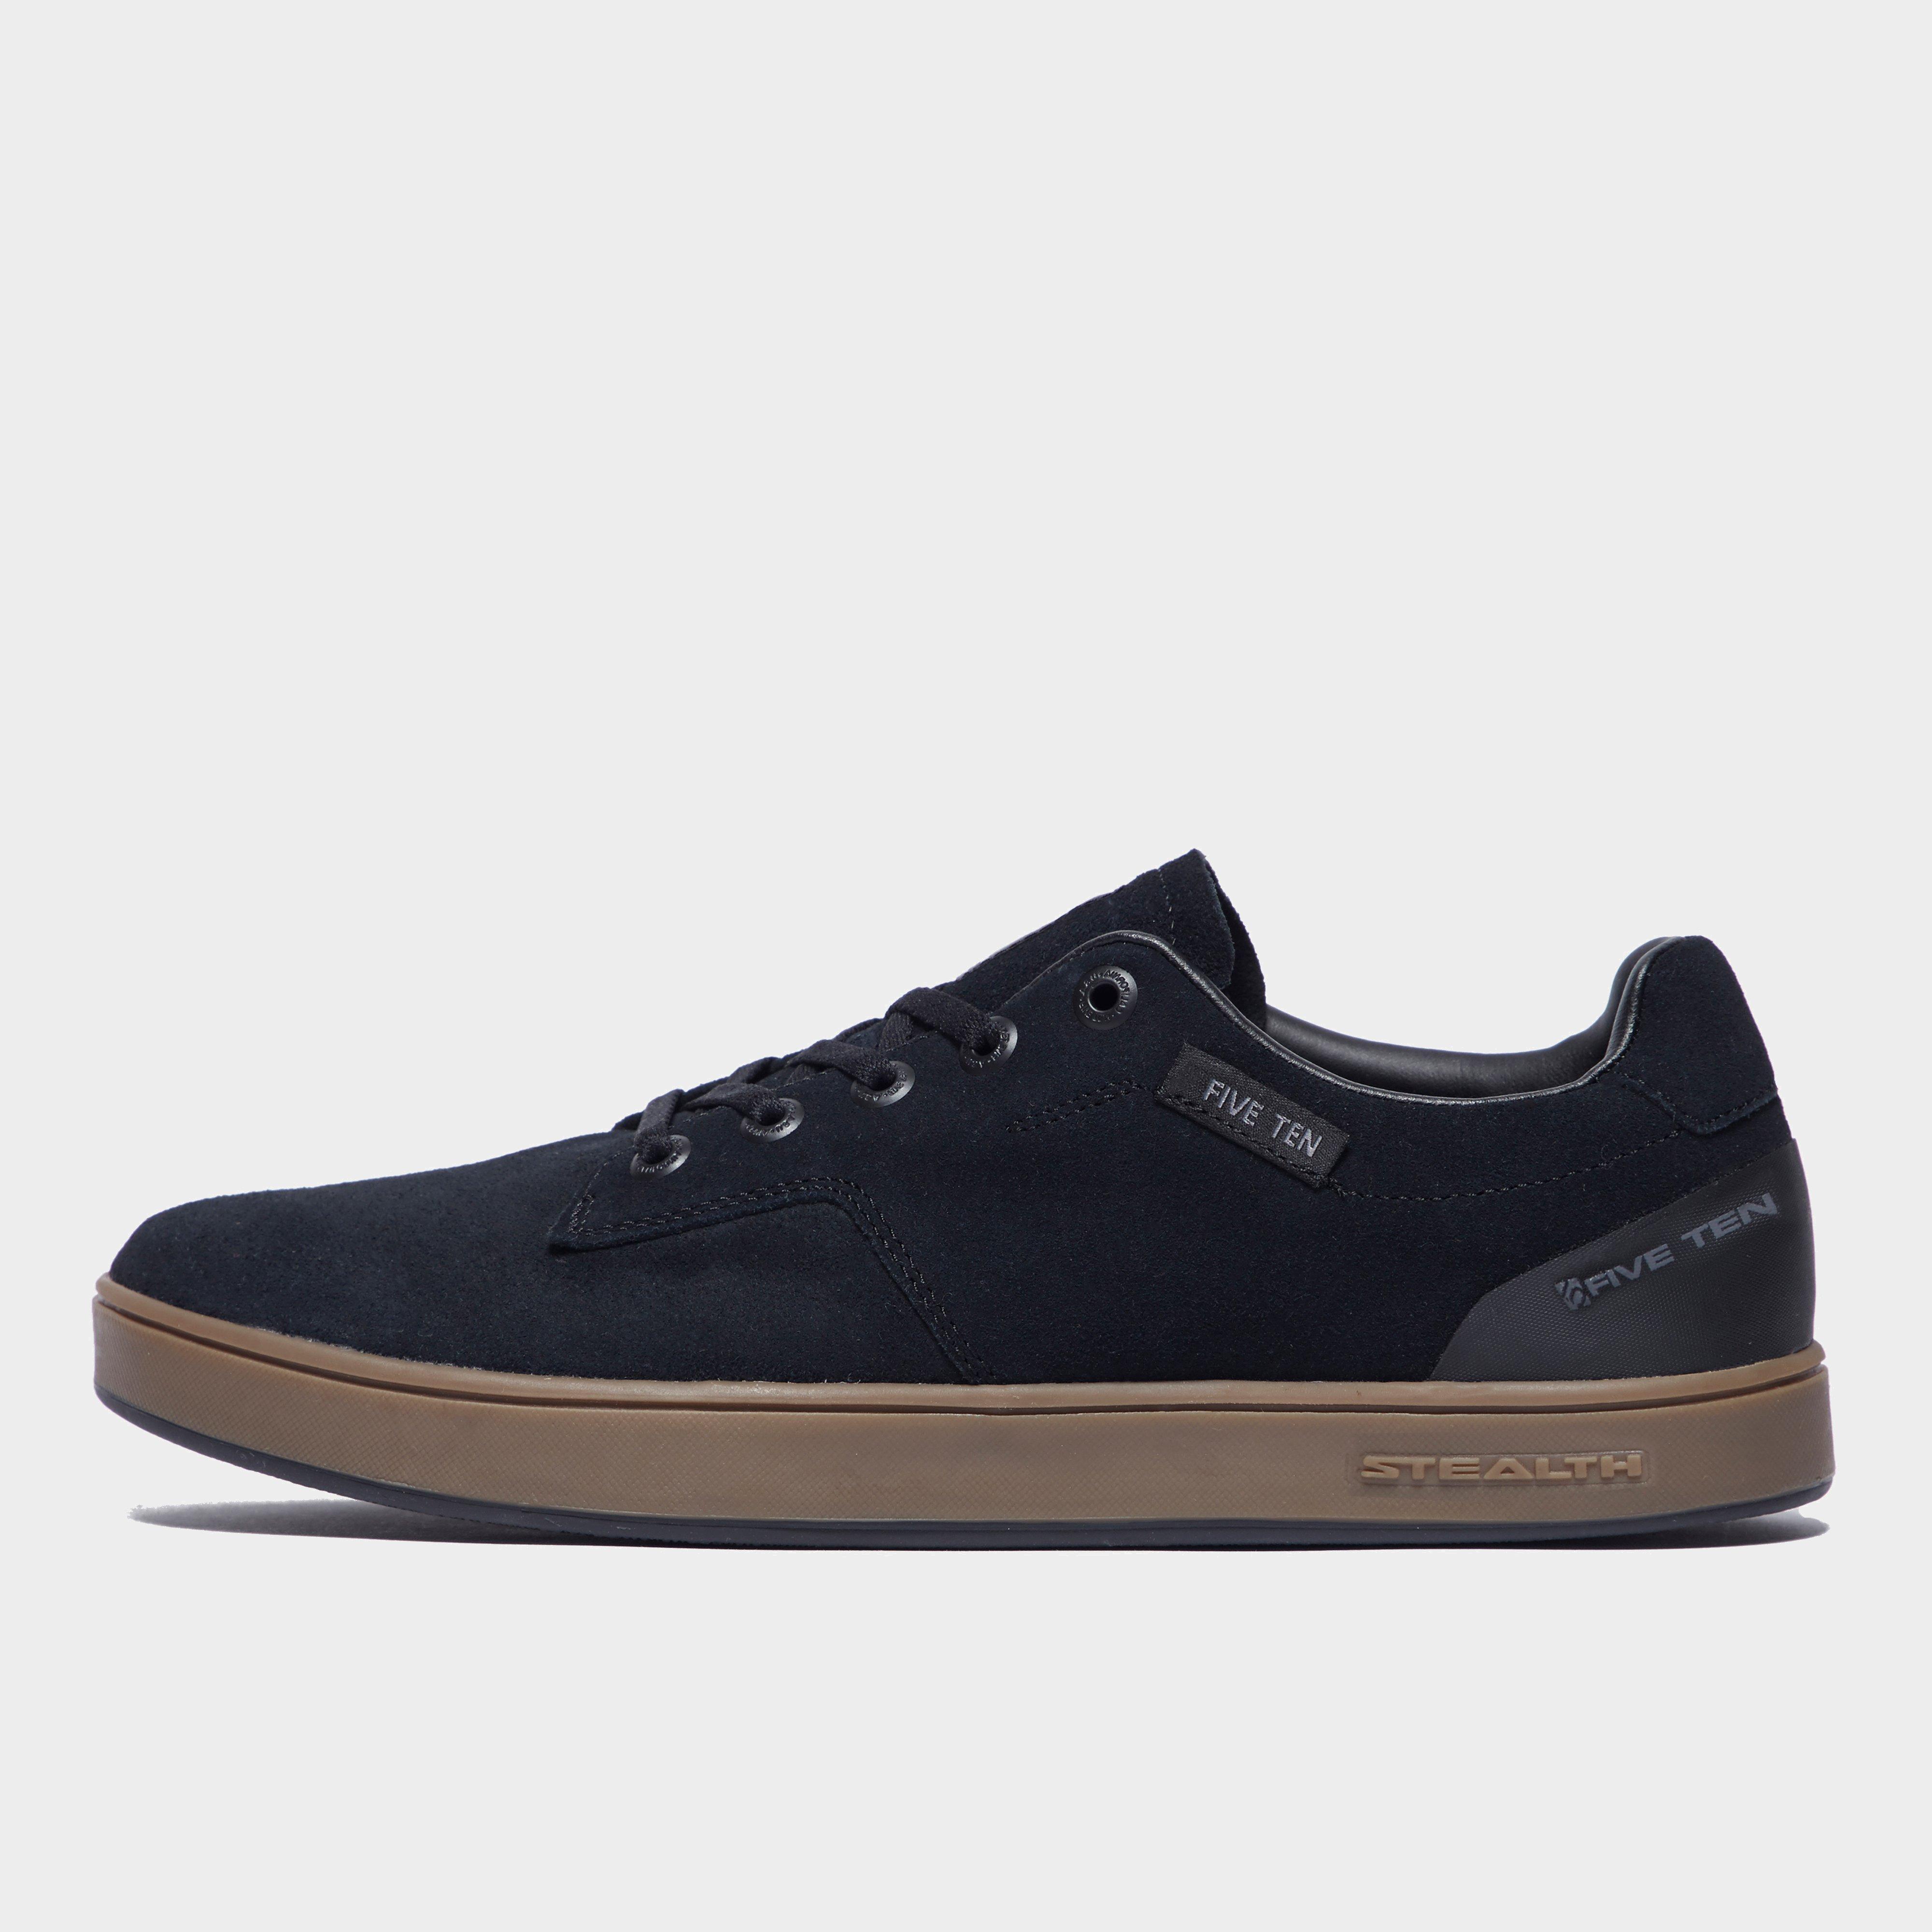 Adidas Five Ten Adidas Five Ten Unisex Sleuth Core Shoes - Black, Black